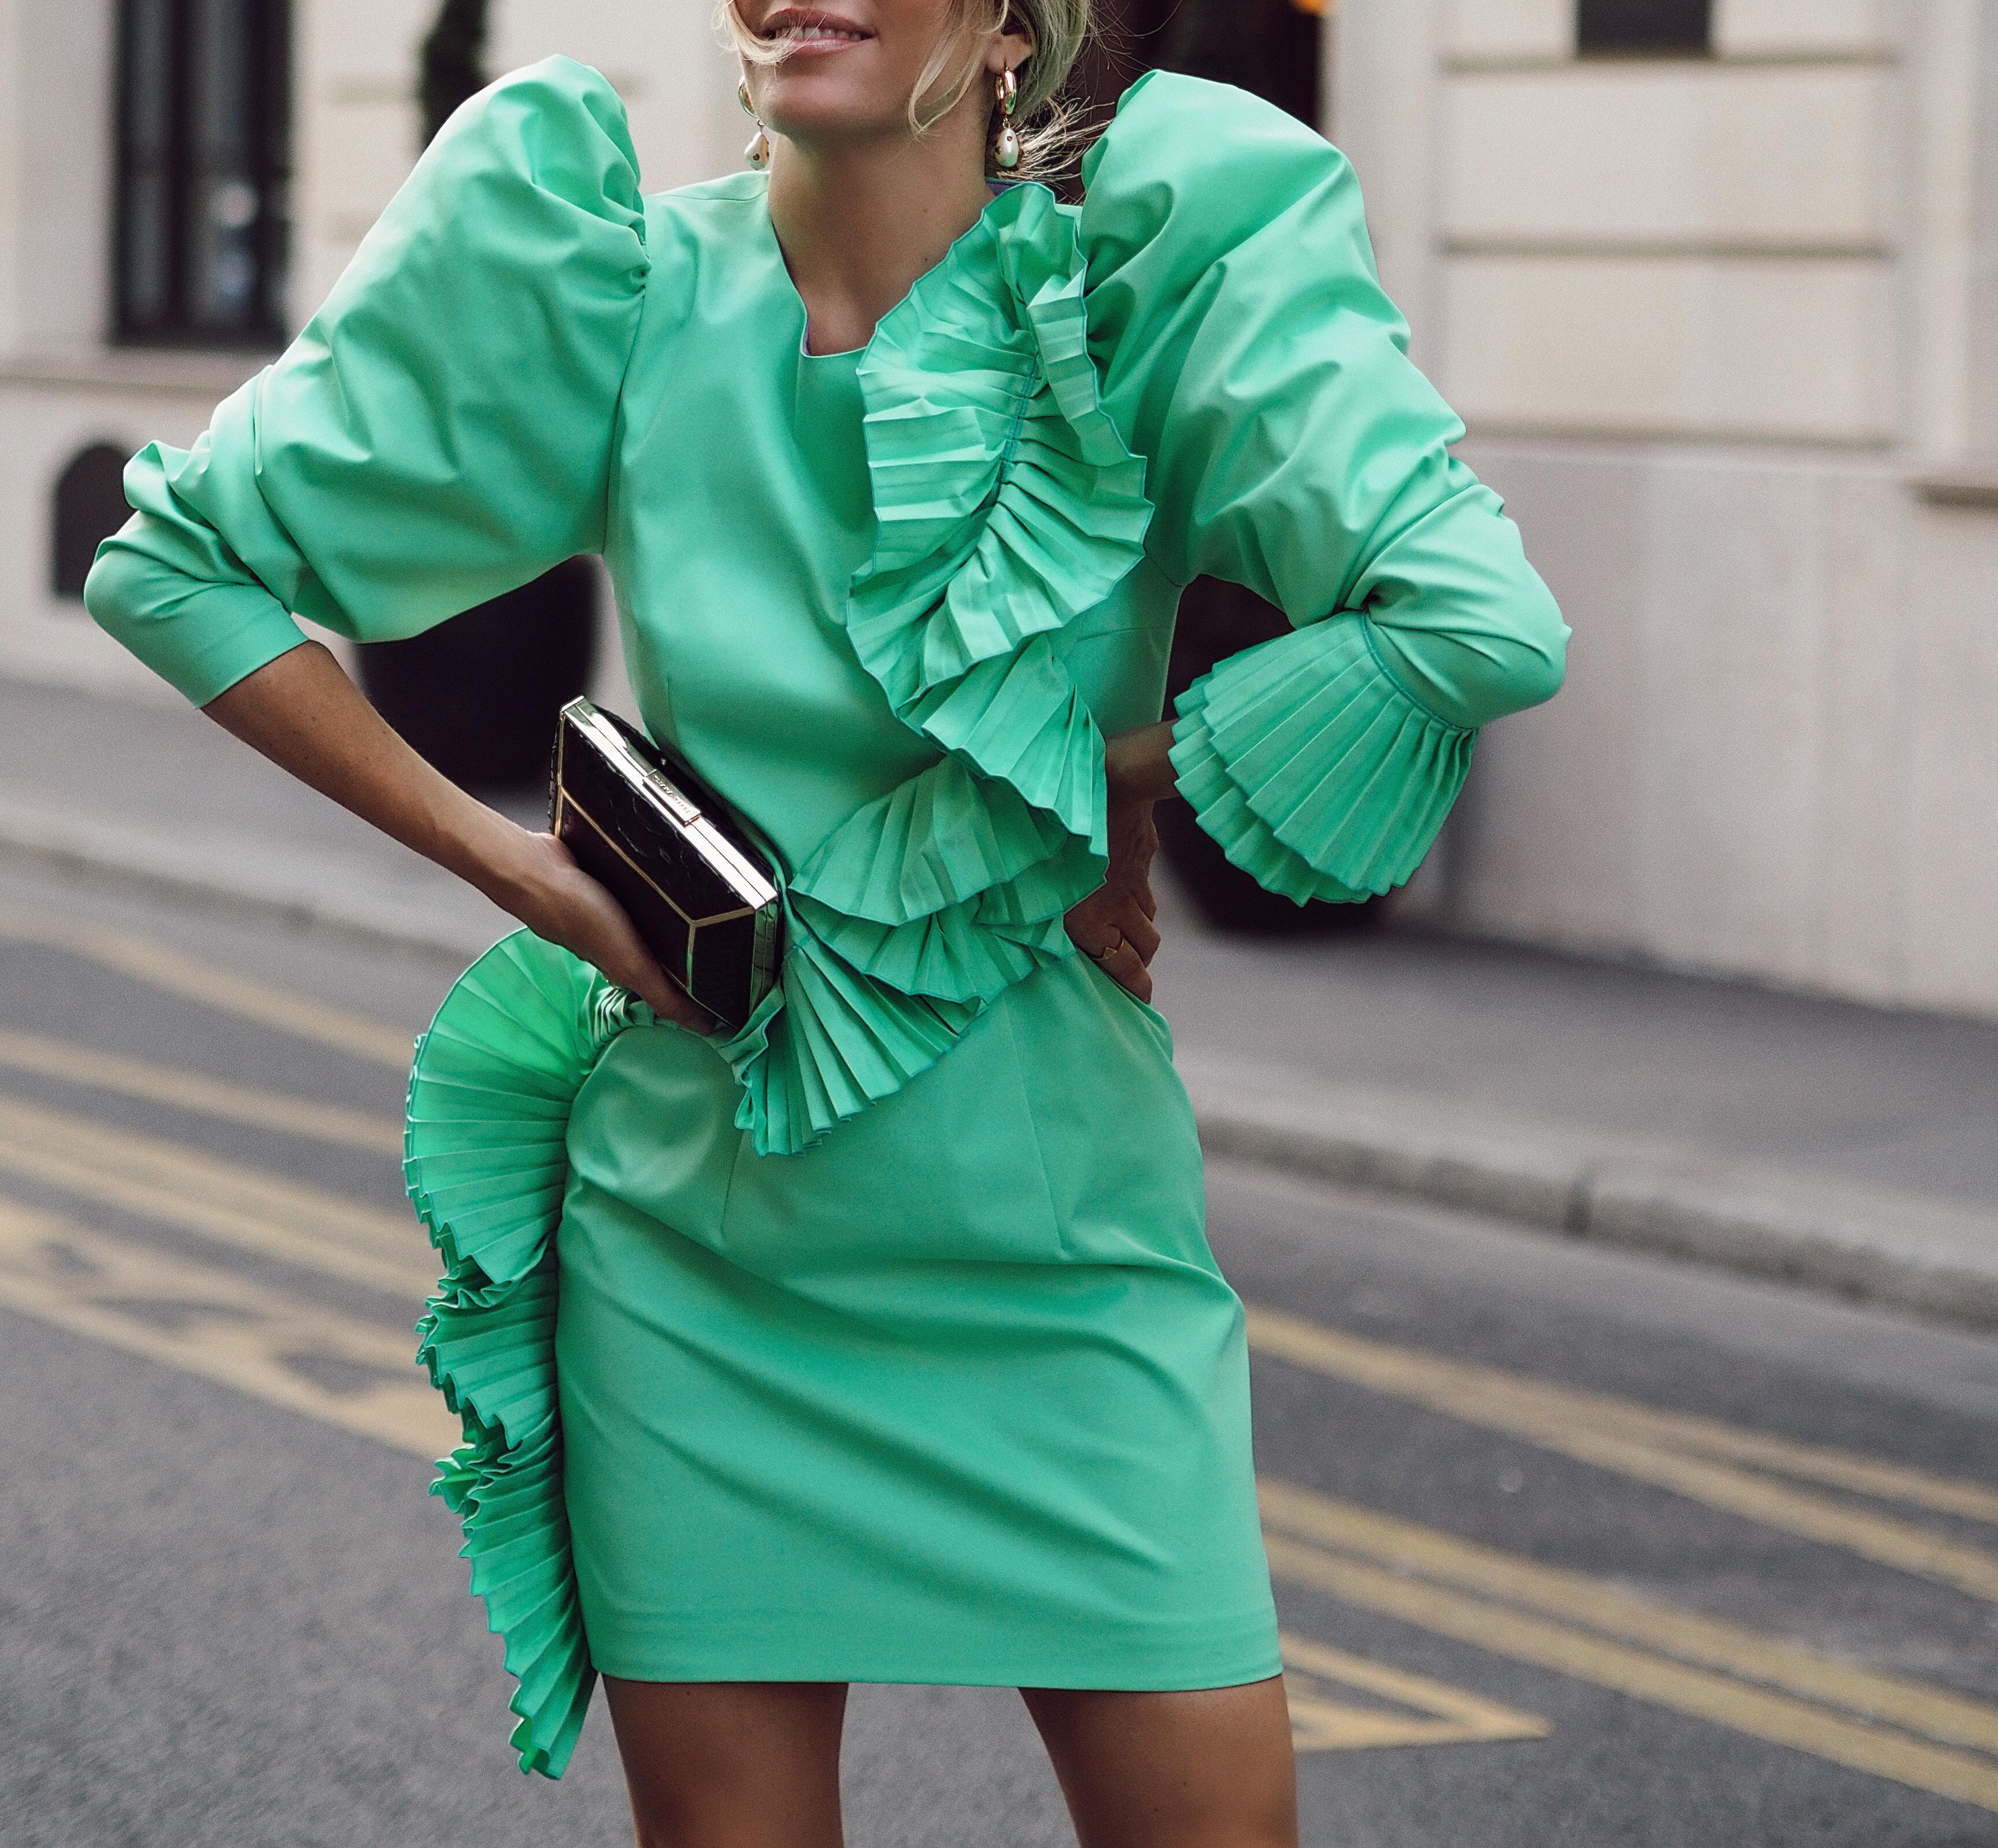 puff-sleeves-dress-street-style